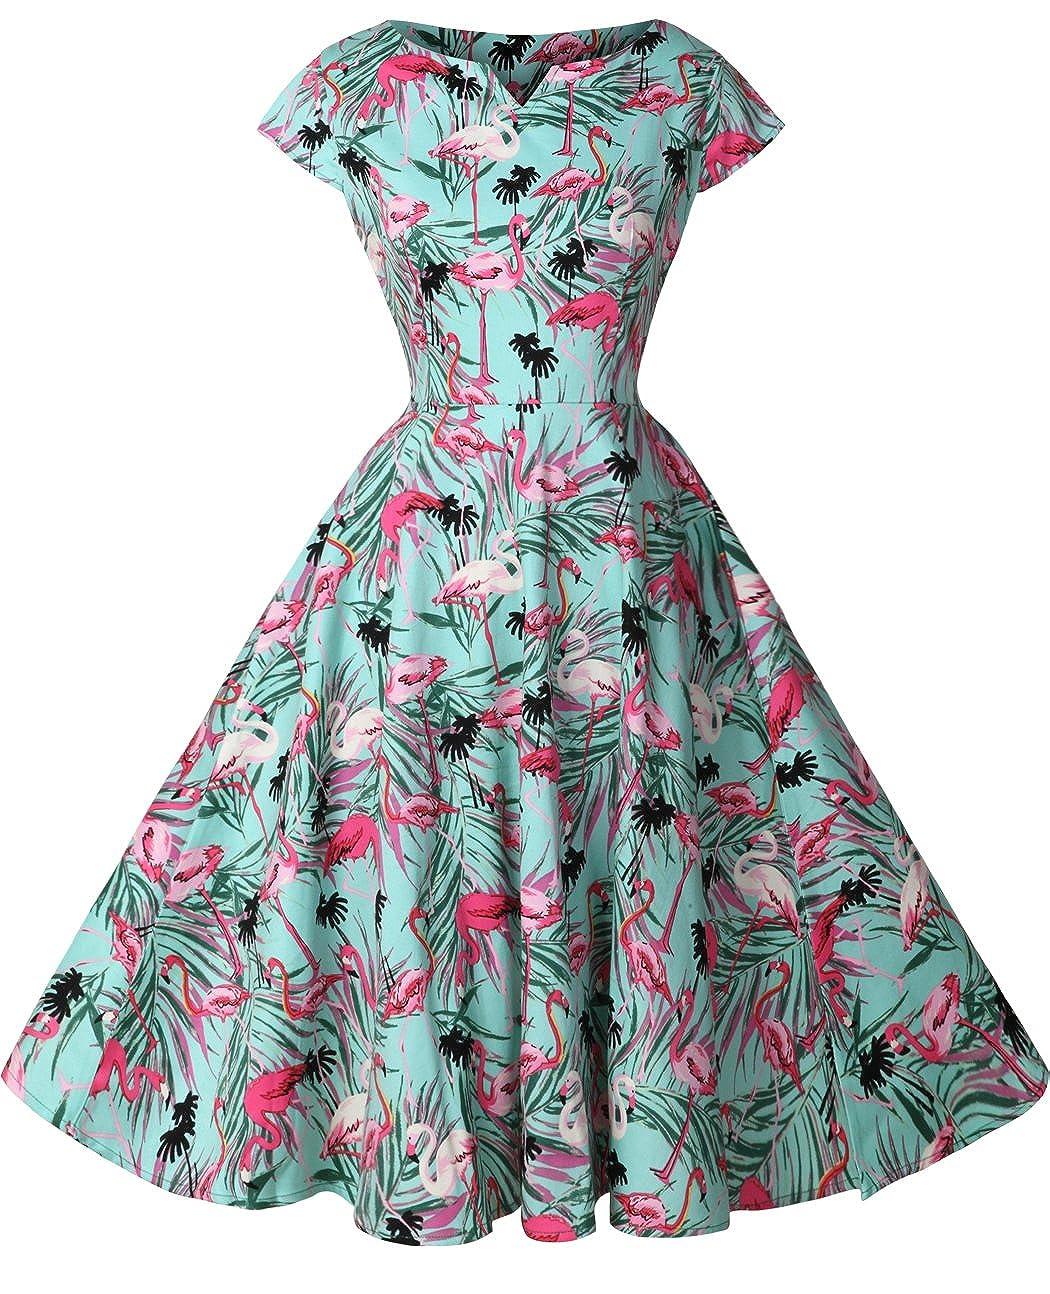 TALLA XXL. FAIRY COUPLE 1950S Vintage Rockabilly Lunares Cap Mangas Vestido de Baile DRT019 Verde Flamingo XXL